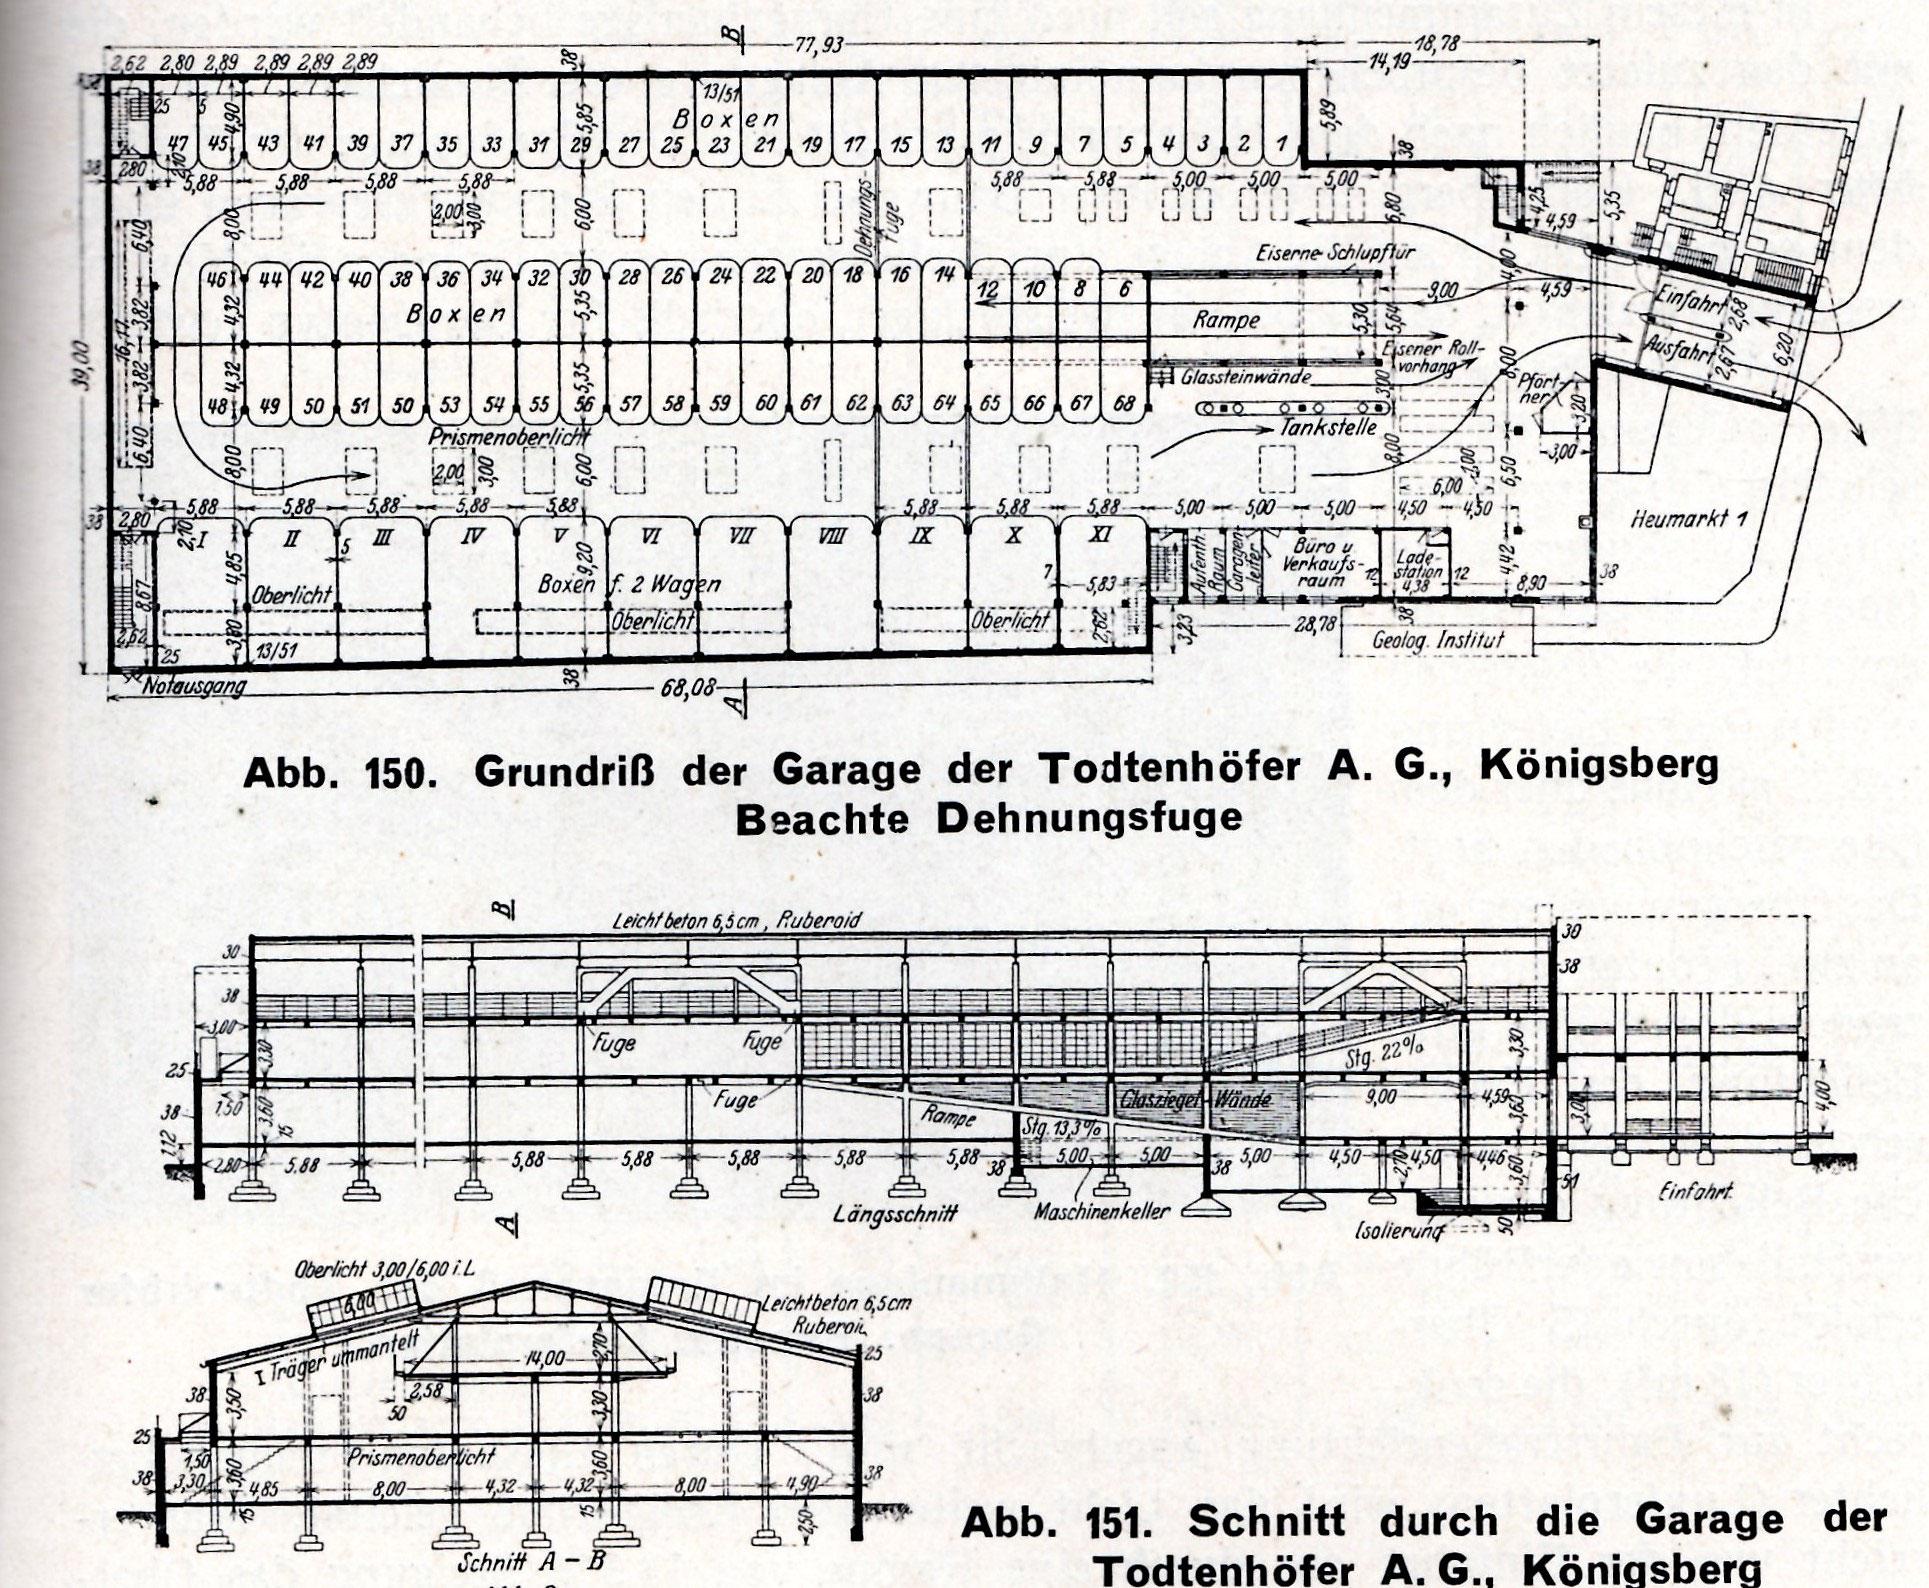 CHRONIK 1895 - 1955 - masovia-todtenhoefers Webseite!